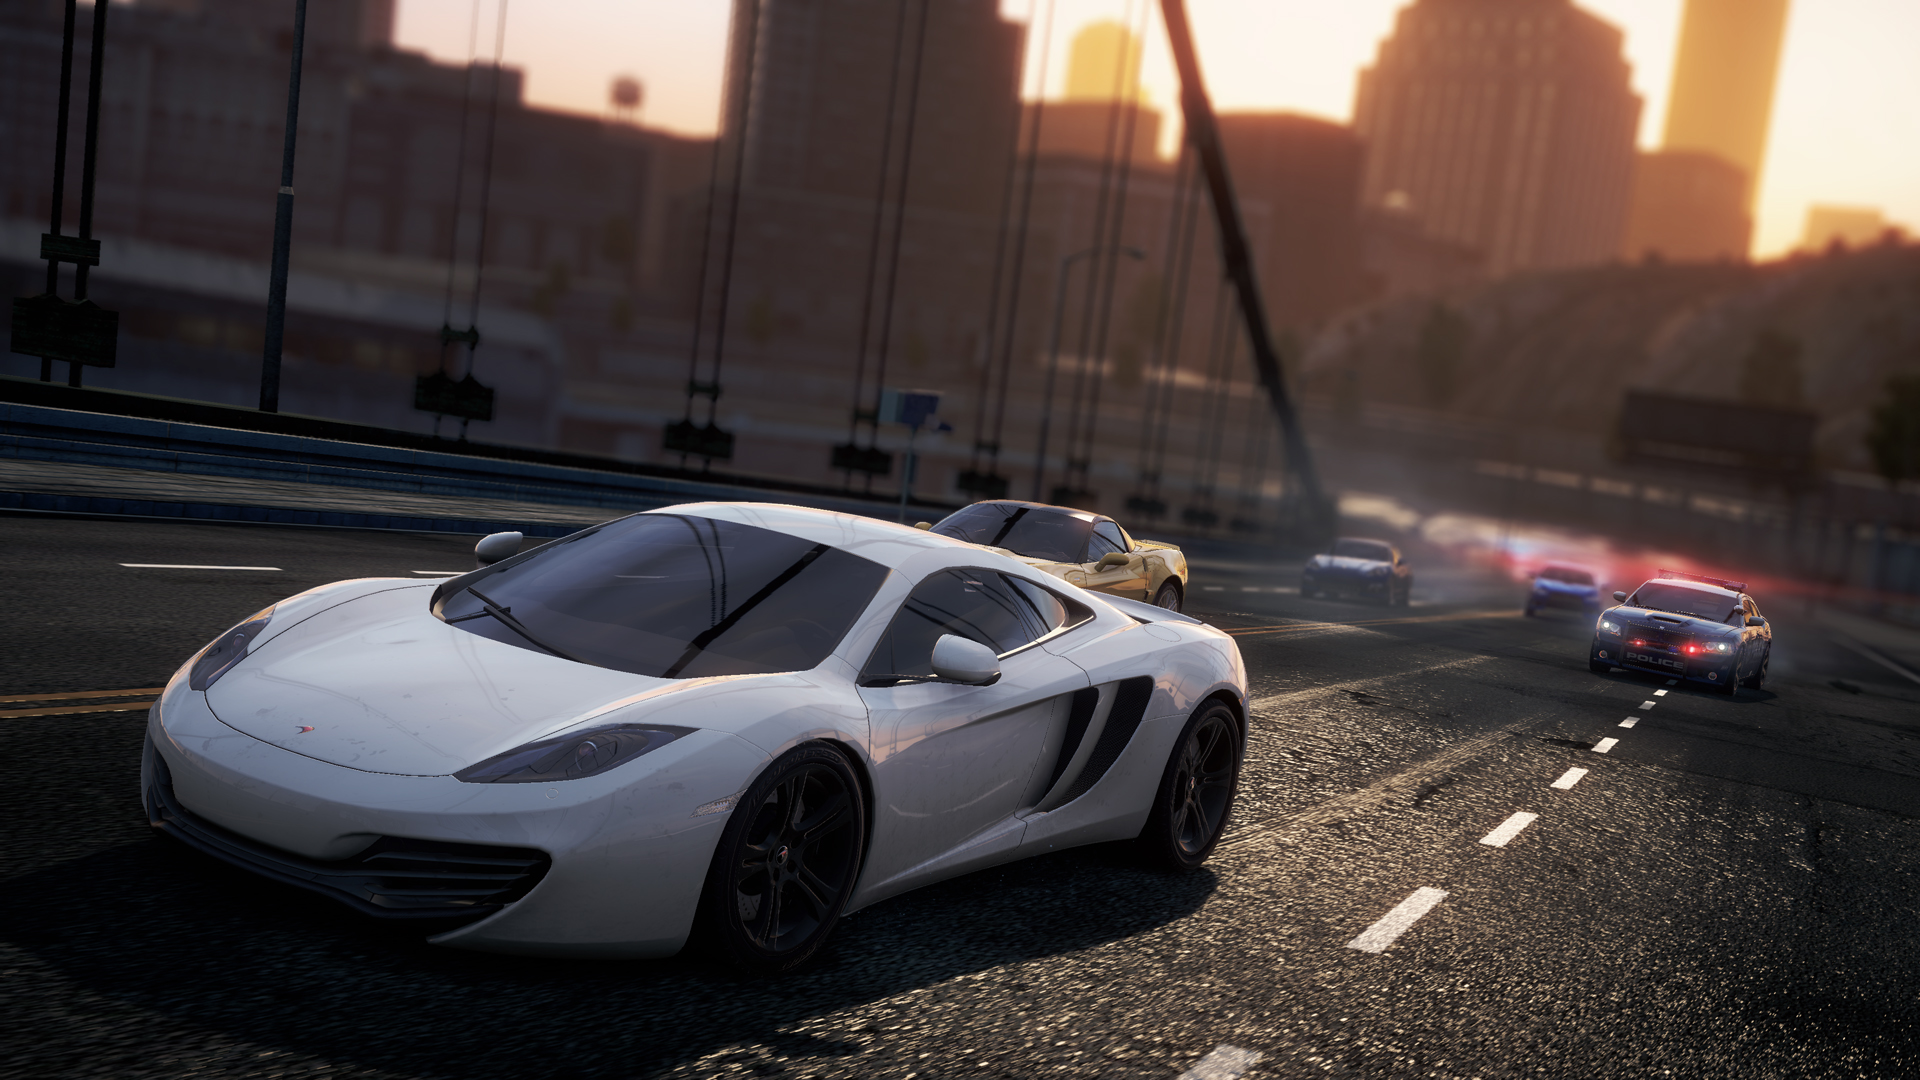 4267_big Breathtaking Lamborghini Countach Need for Speed Cars Trend